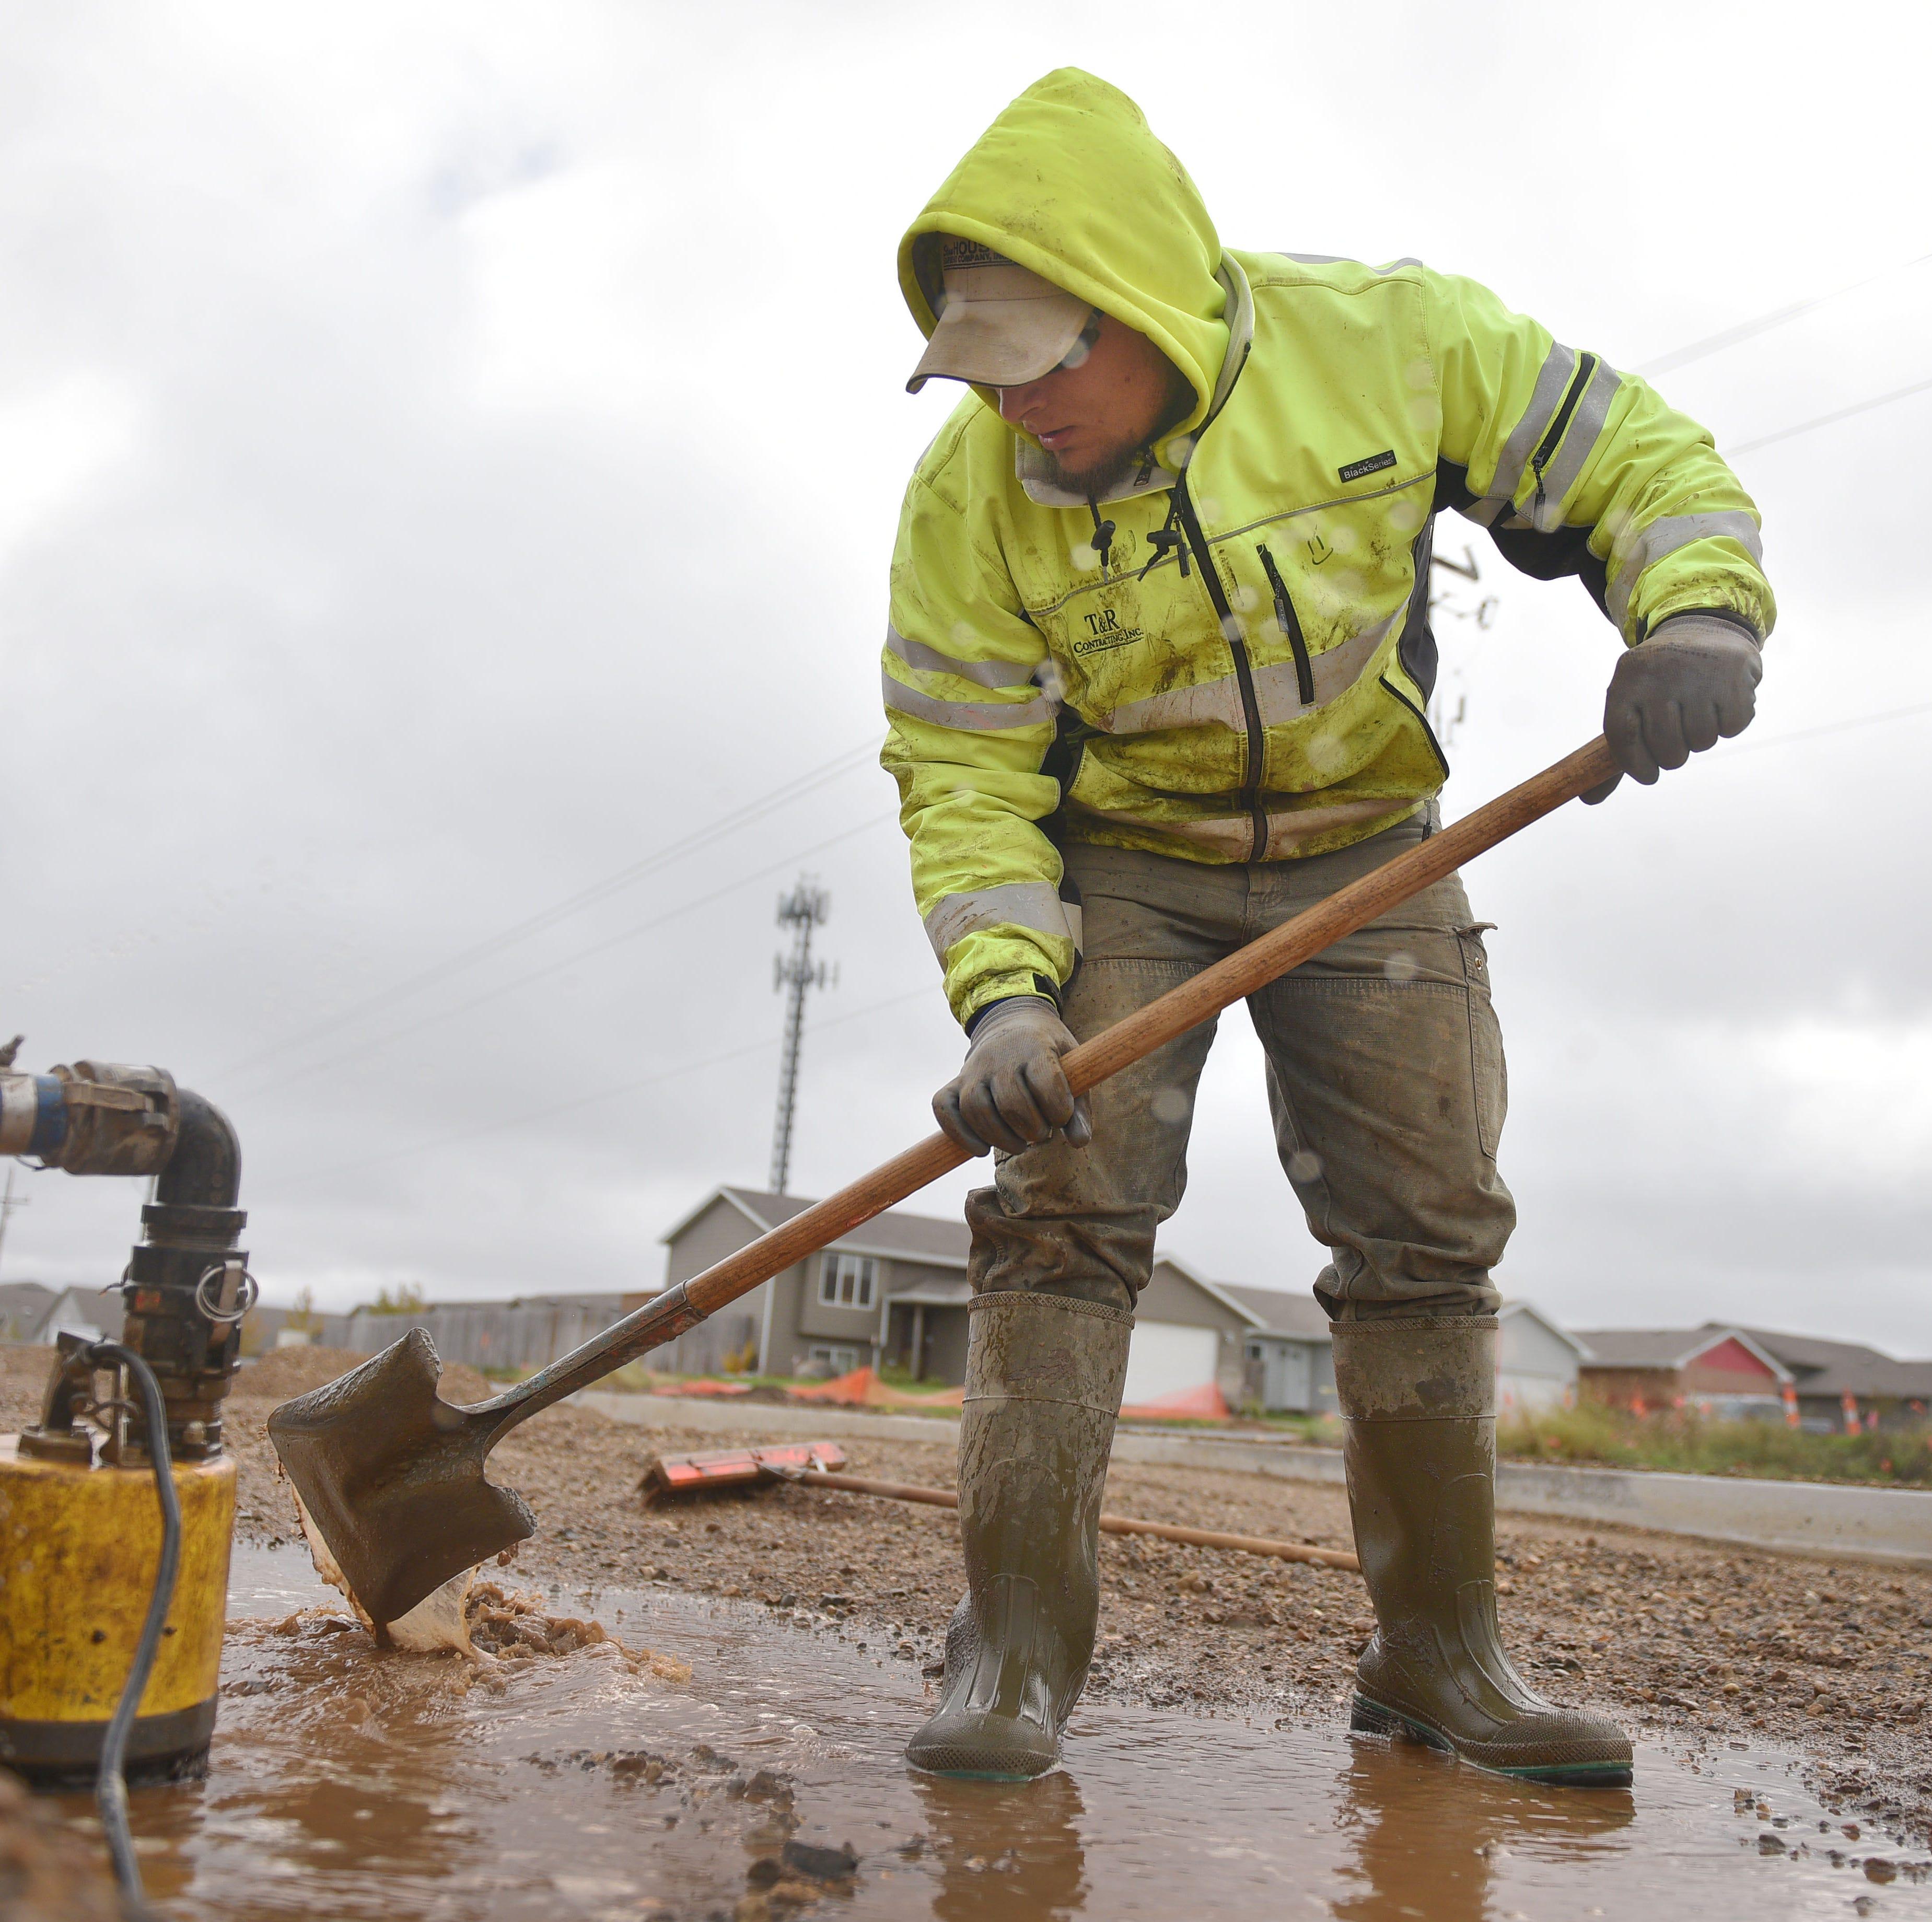 City Hall: Ellis Road construction will last until at least September